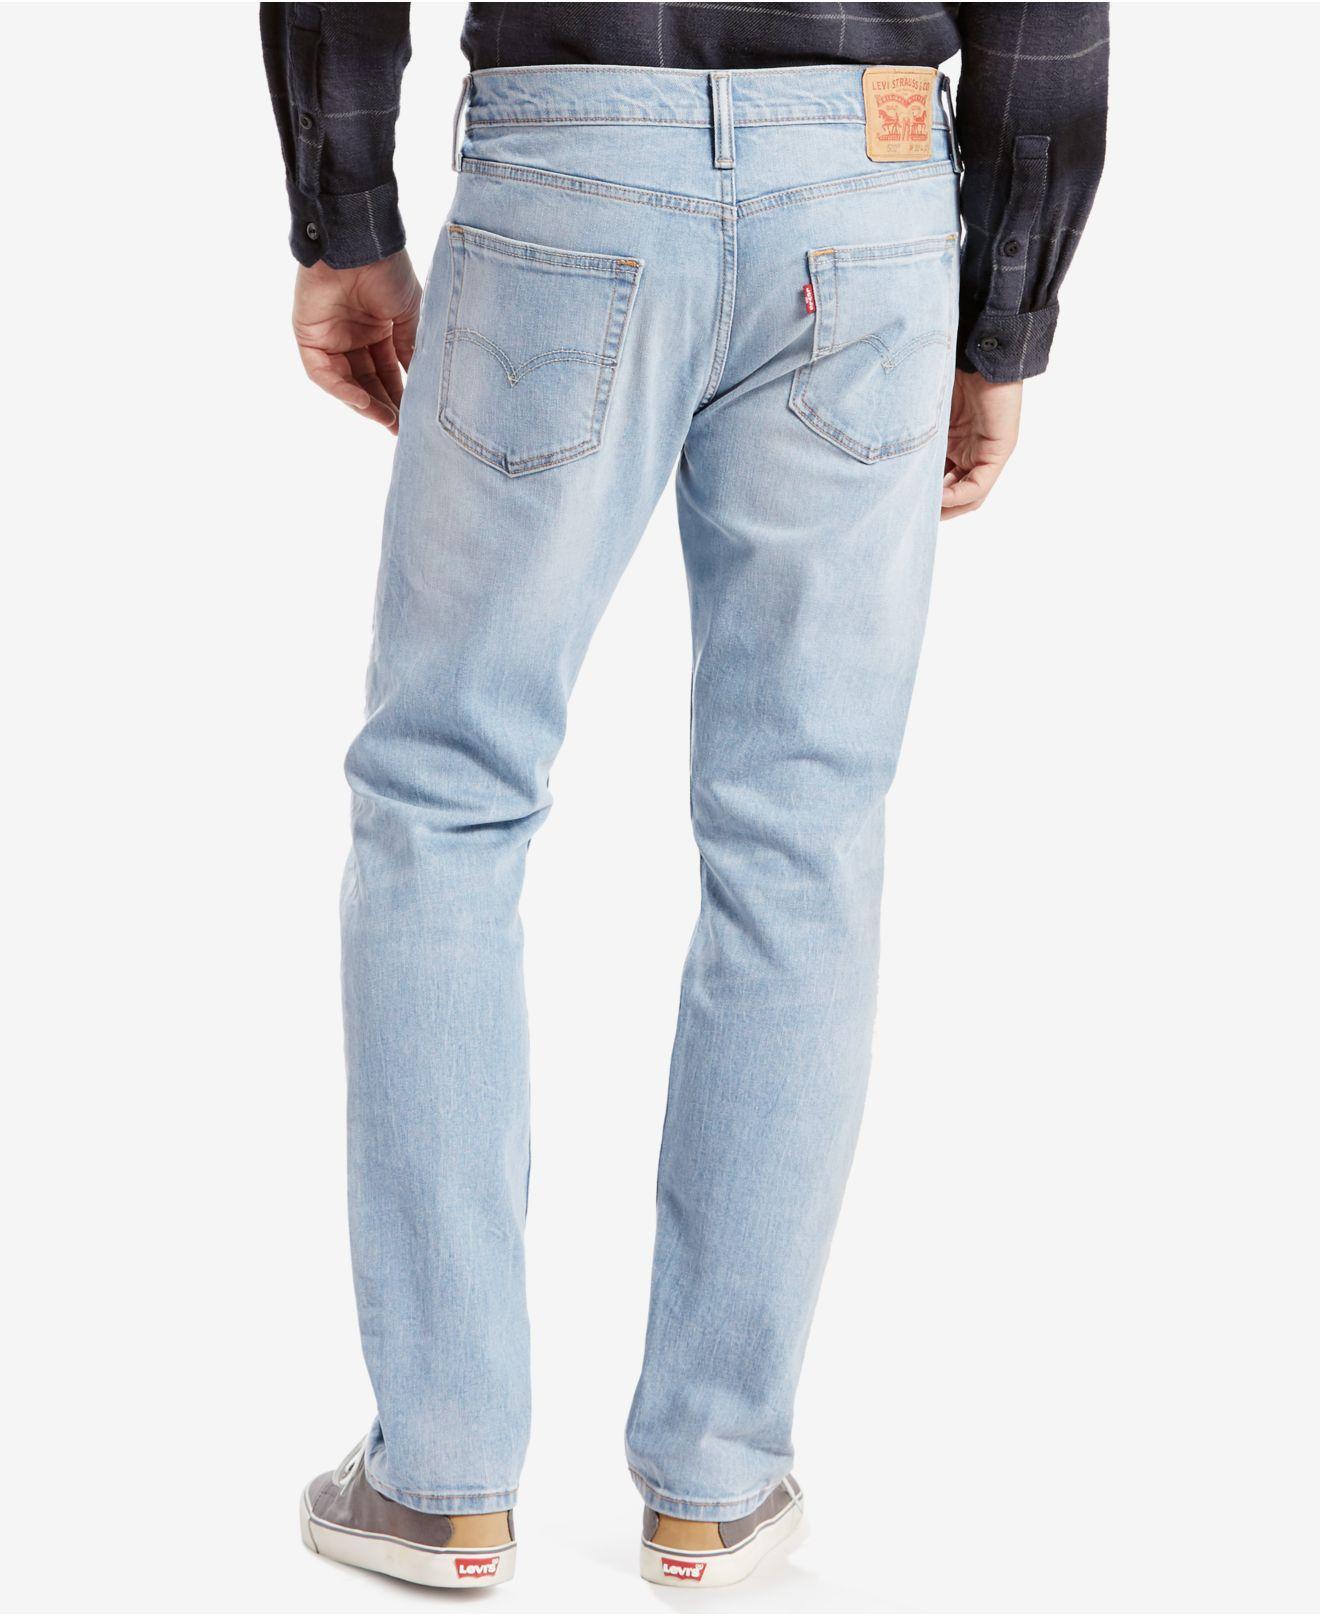 96368850 Levi's 502tm Regular Tapered Fit Jeans in Blue for Men - Lyst